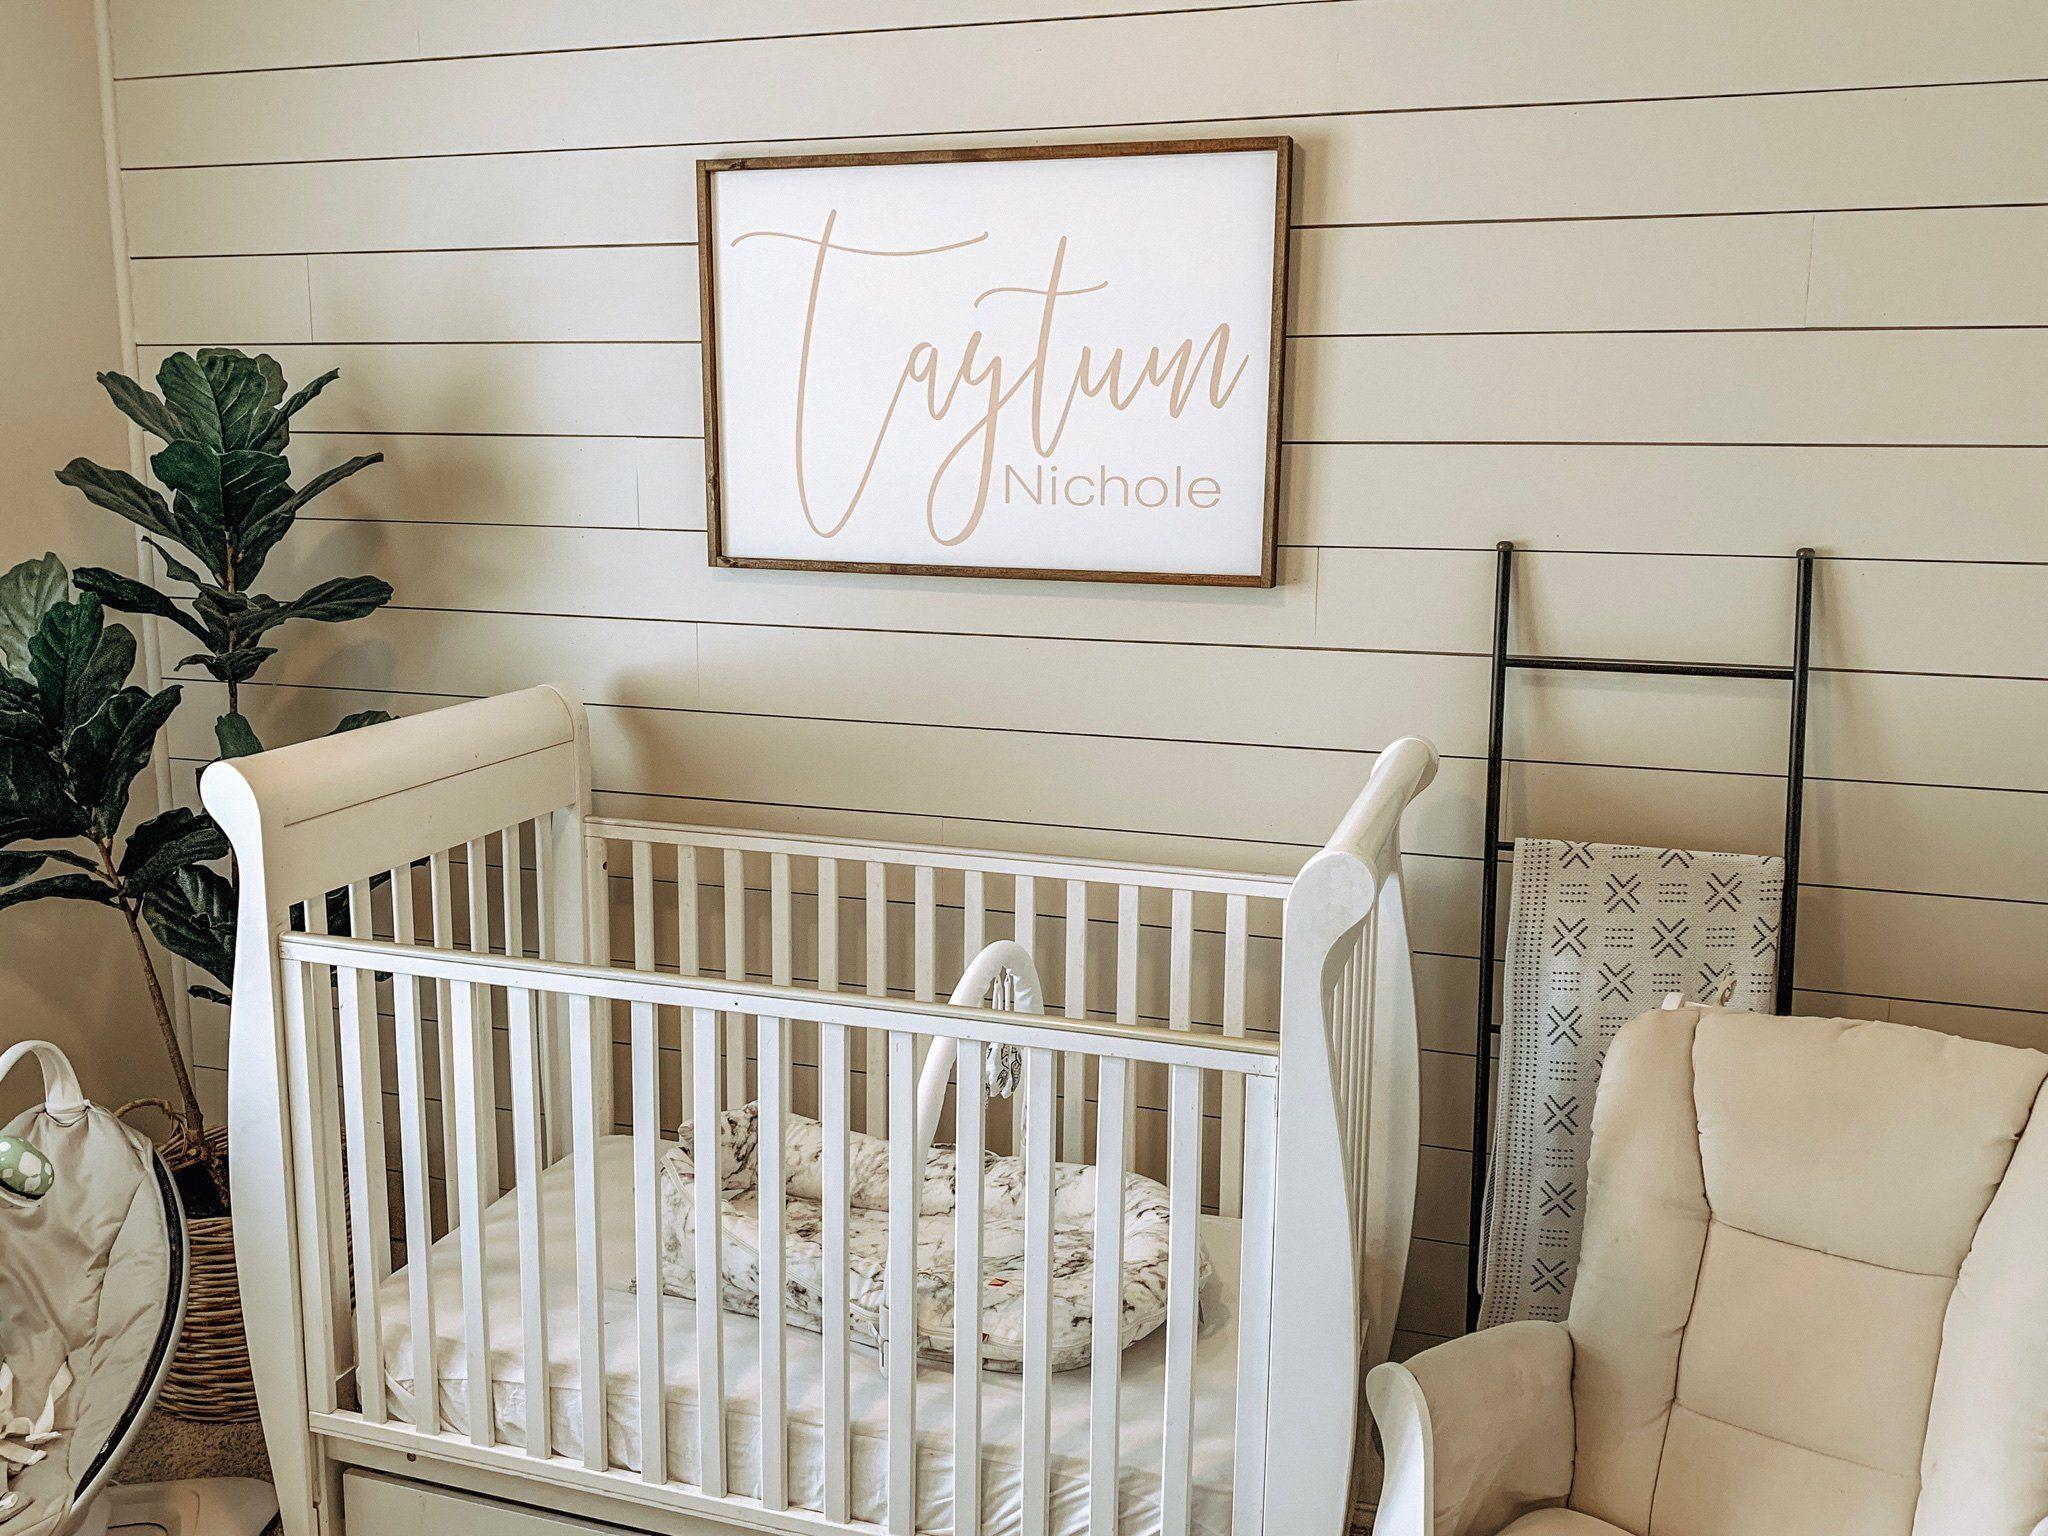 kid room decor Custom name sign for baby room boy room decor nursery decor girl room decor